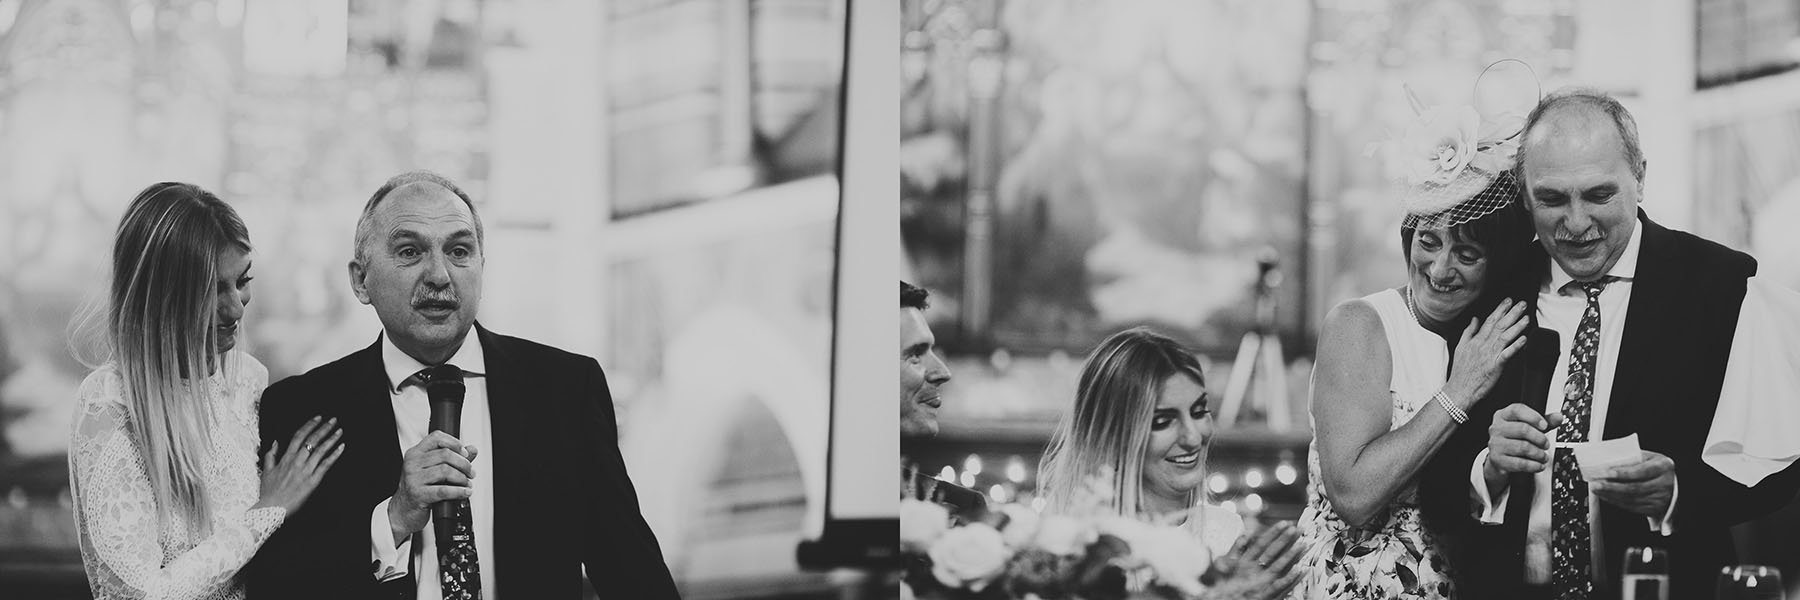 eastbourne-wedding-photography-hannah-tom-069